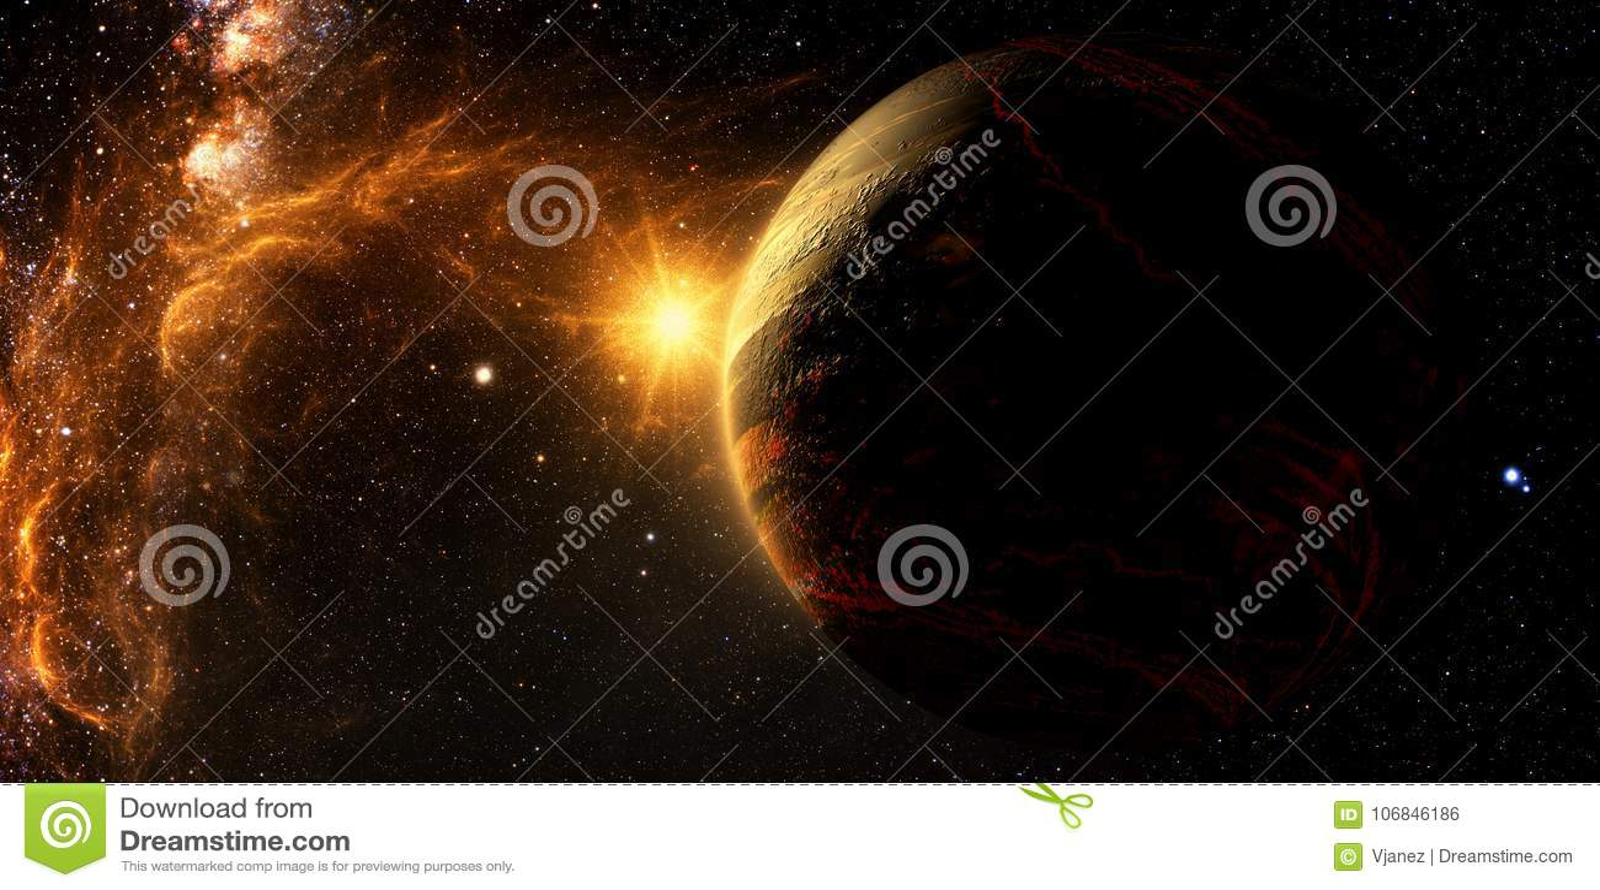 Exoplanetexploratie - Fantasie